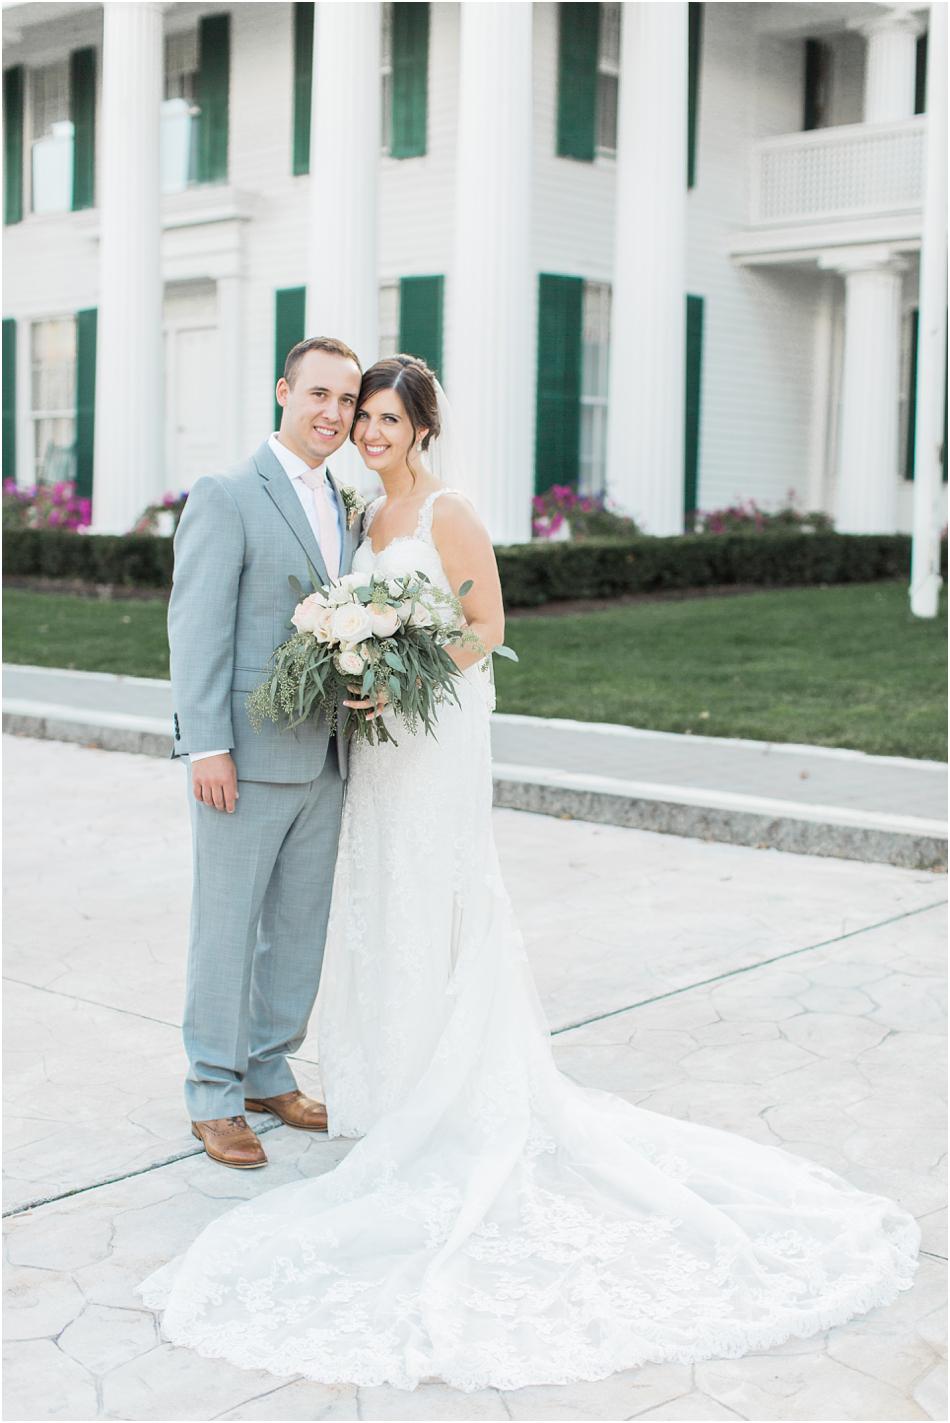 equinox_resort_golf_club_manchester_vermont_jennifer_matt_cape_cod_boston_new_england_wedding_photographer_Meredith_Jane_Photography_photo_2379.jpg